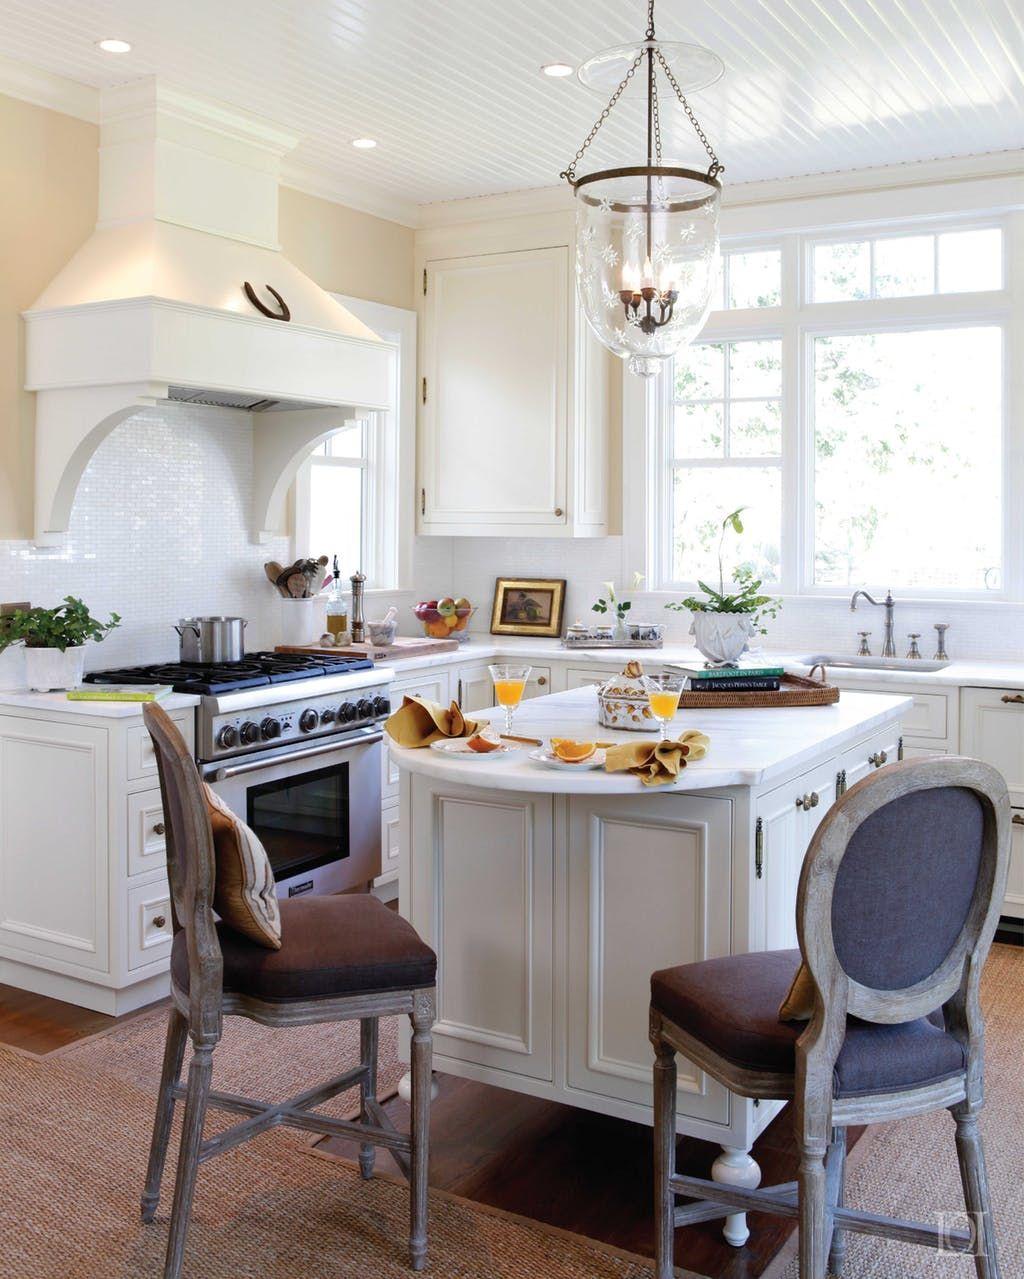 Deborah.leamann.interior.design.portfolio.interiors.kitchen.vignette ...